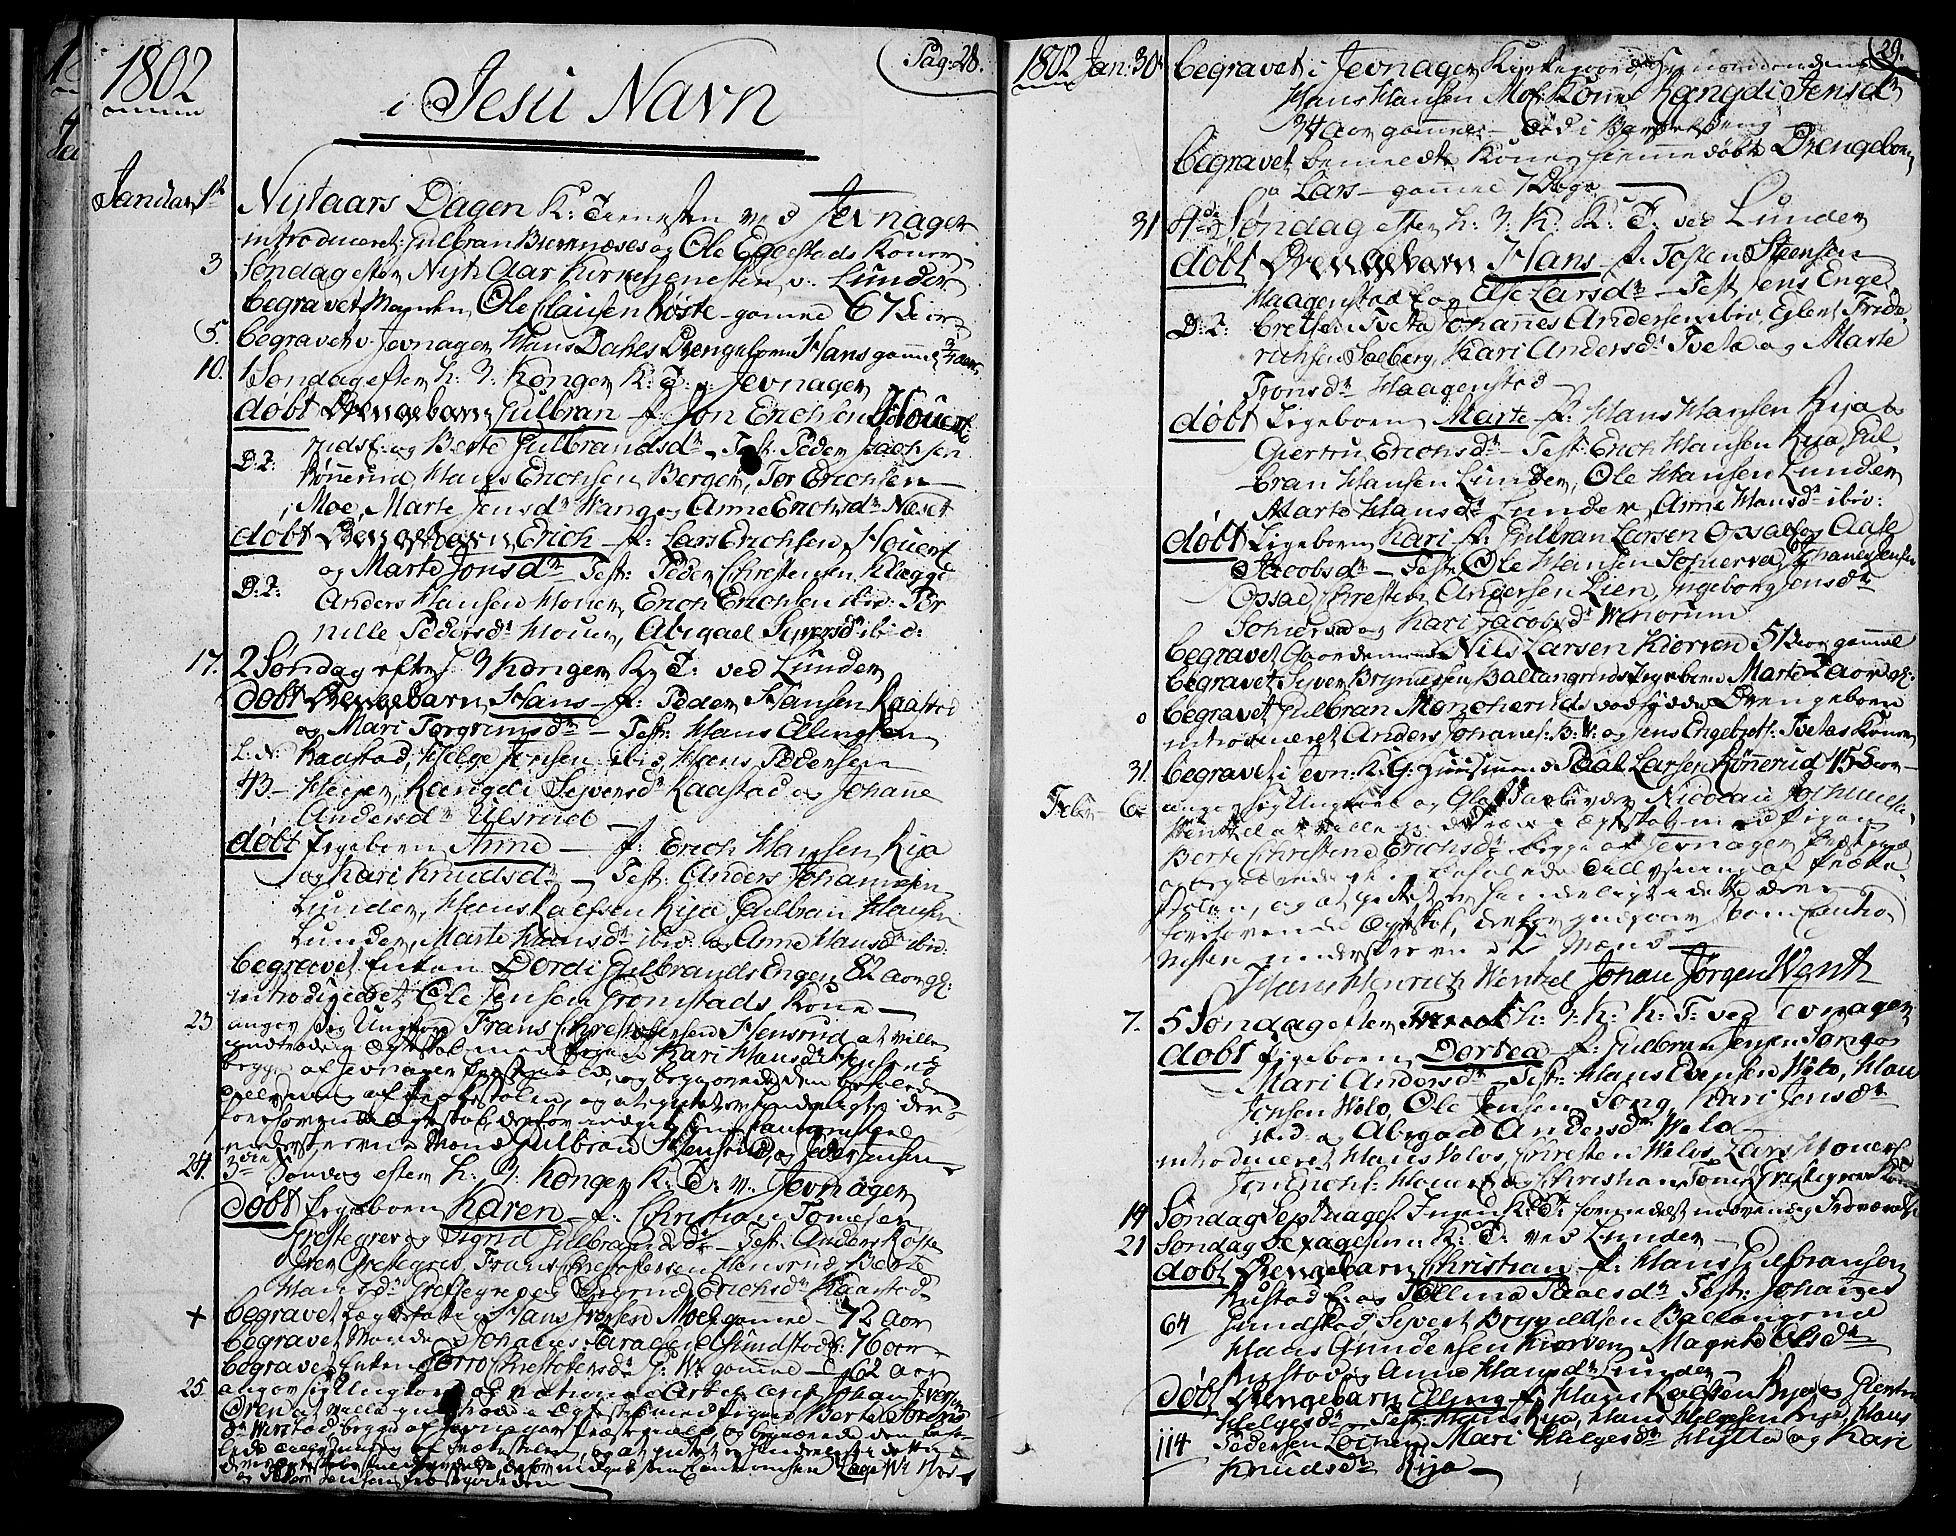 SAH, Jevnaker prestekontor, Ministerialbok nr. 4, 1800-1861, s. 28-29